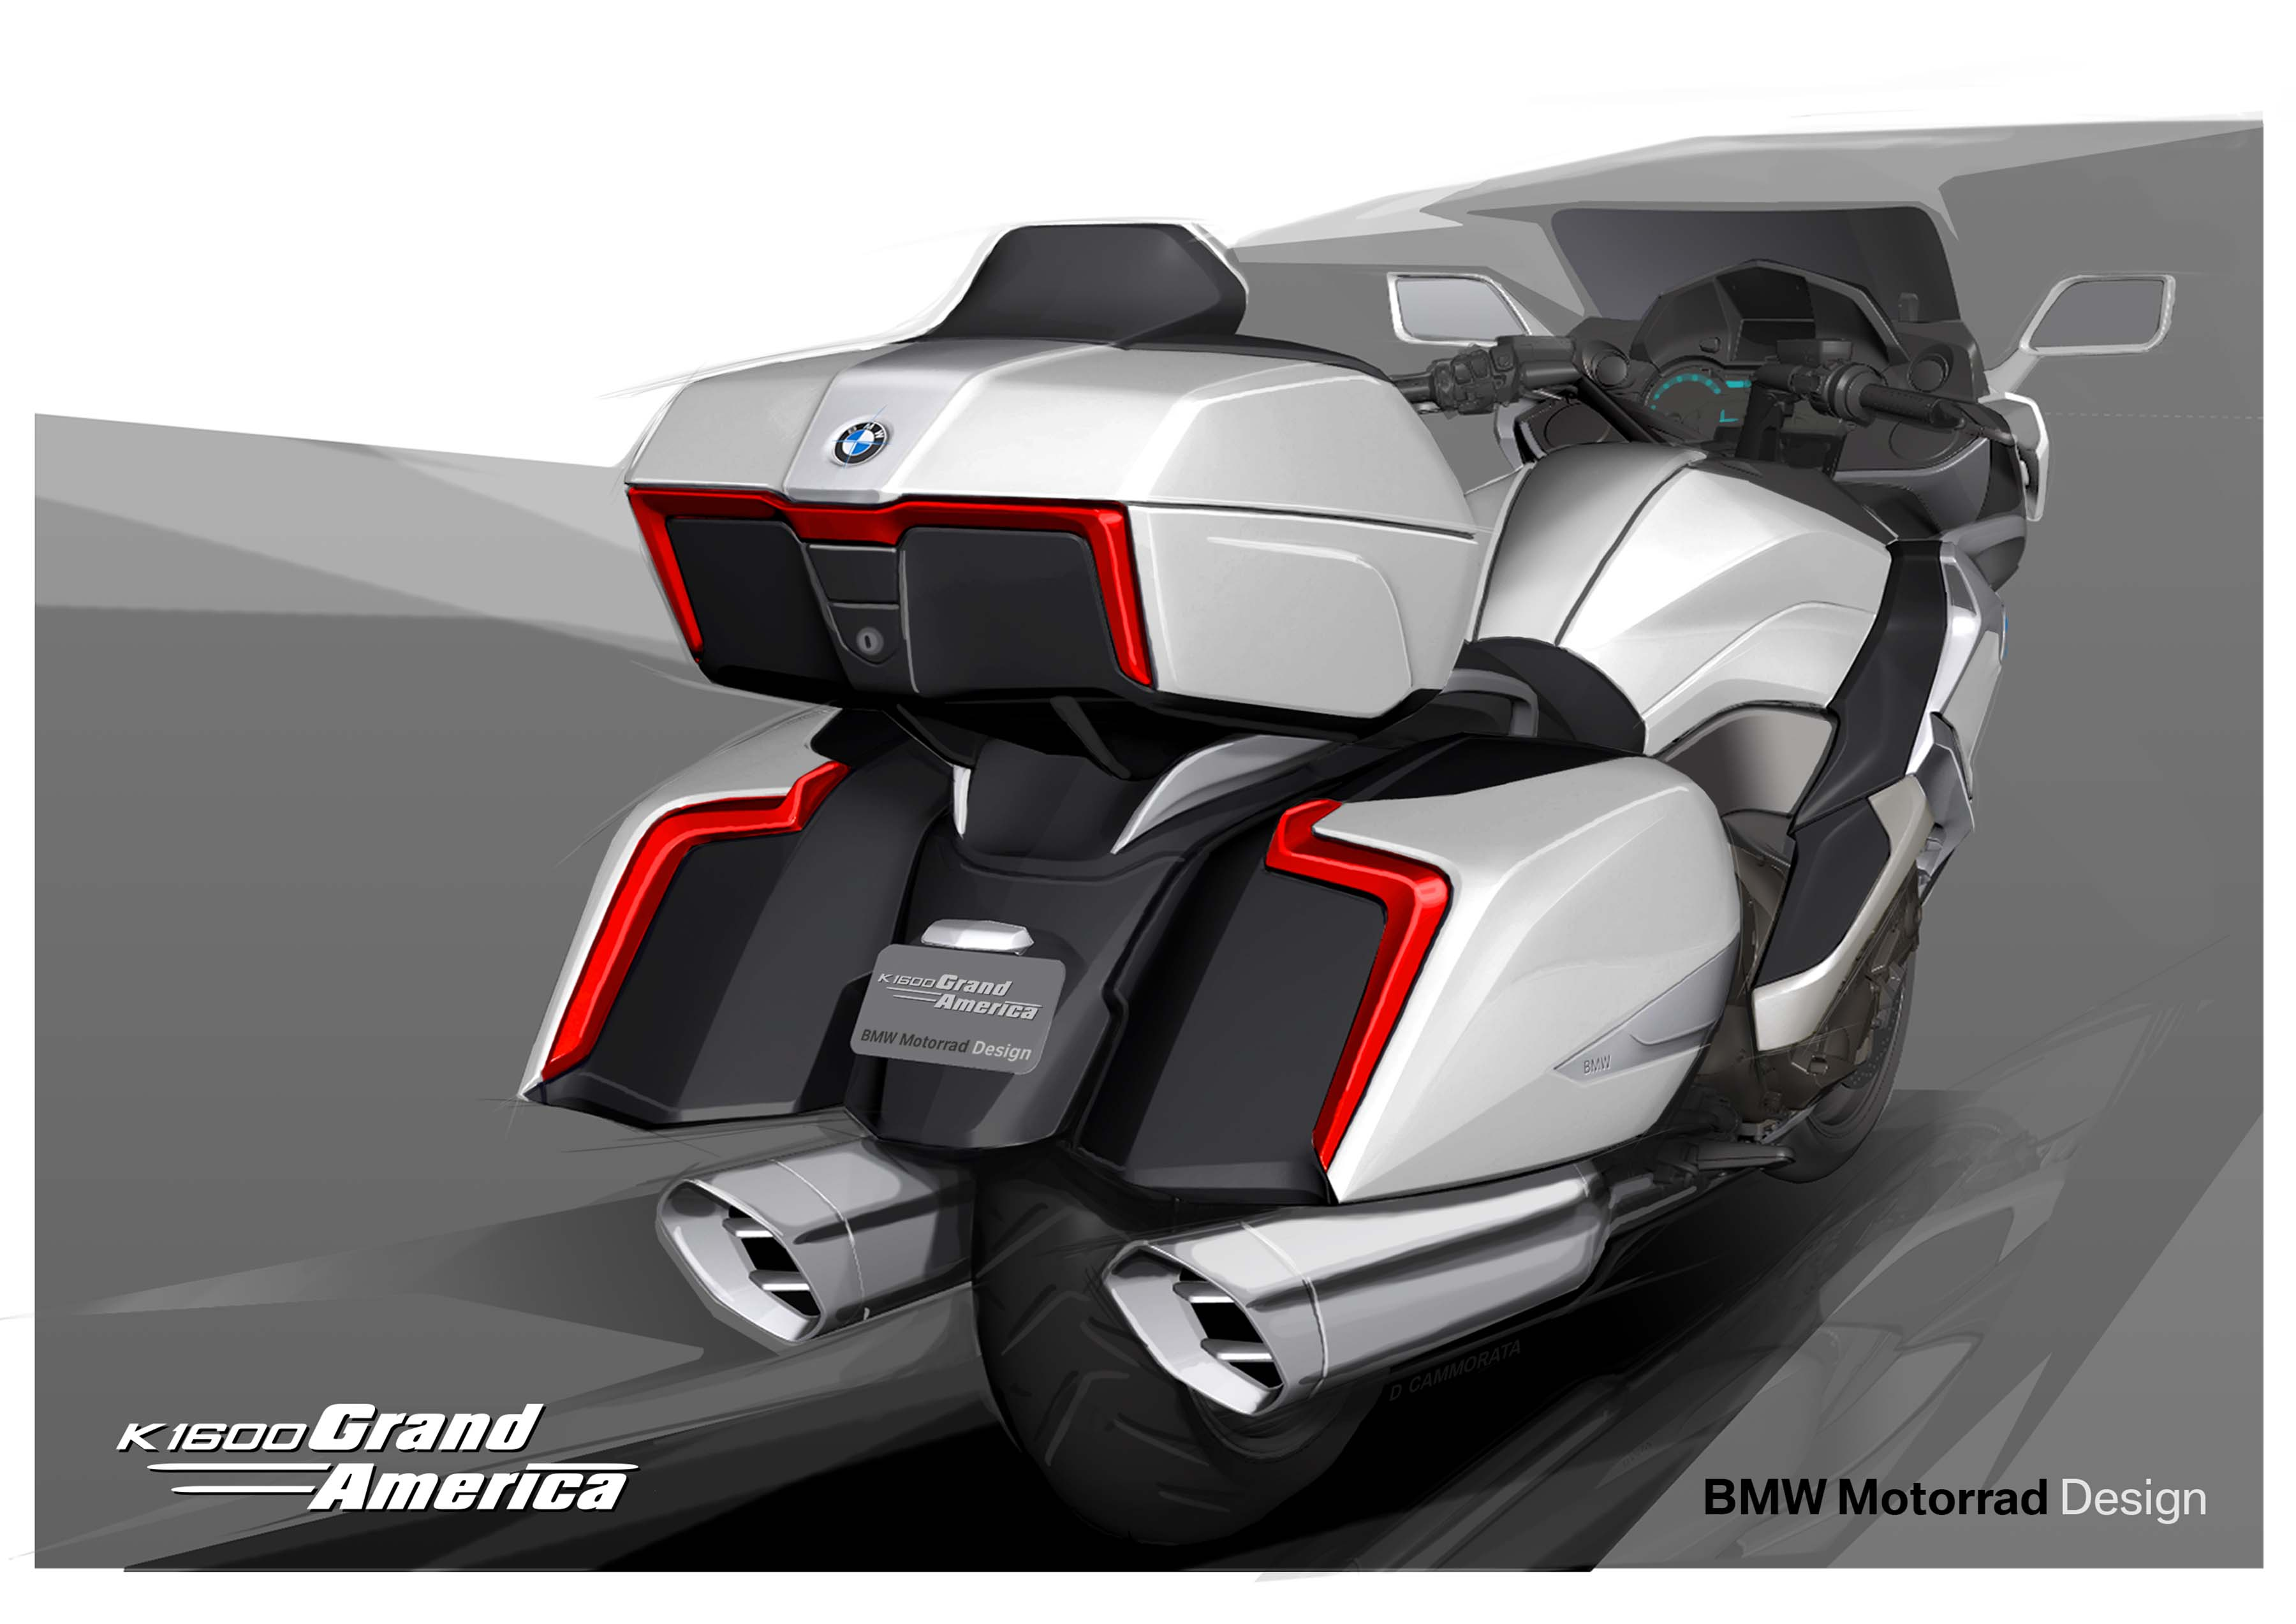 BMW K1600 Grand America - Touring, The American Way ...